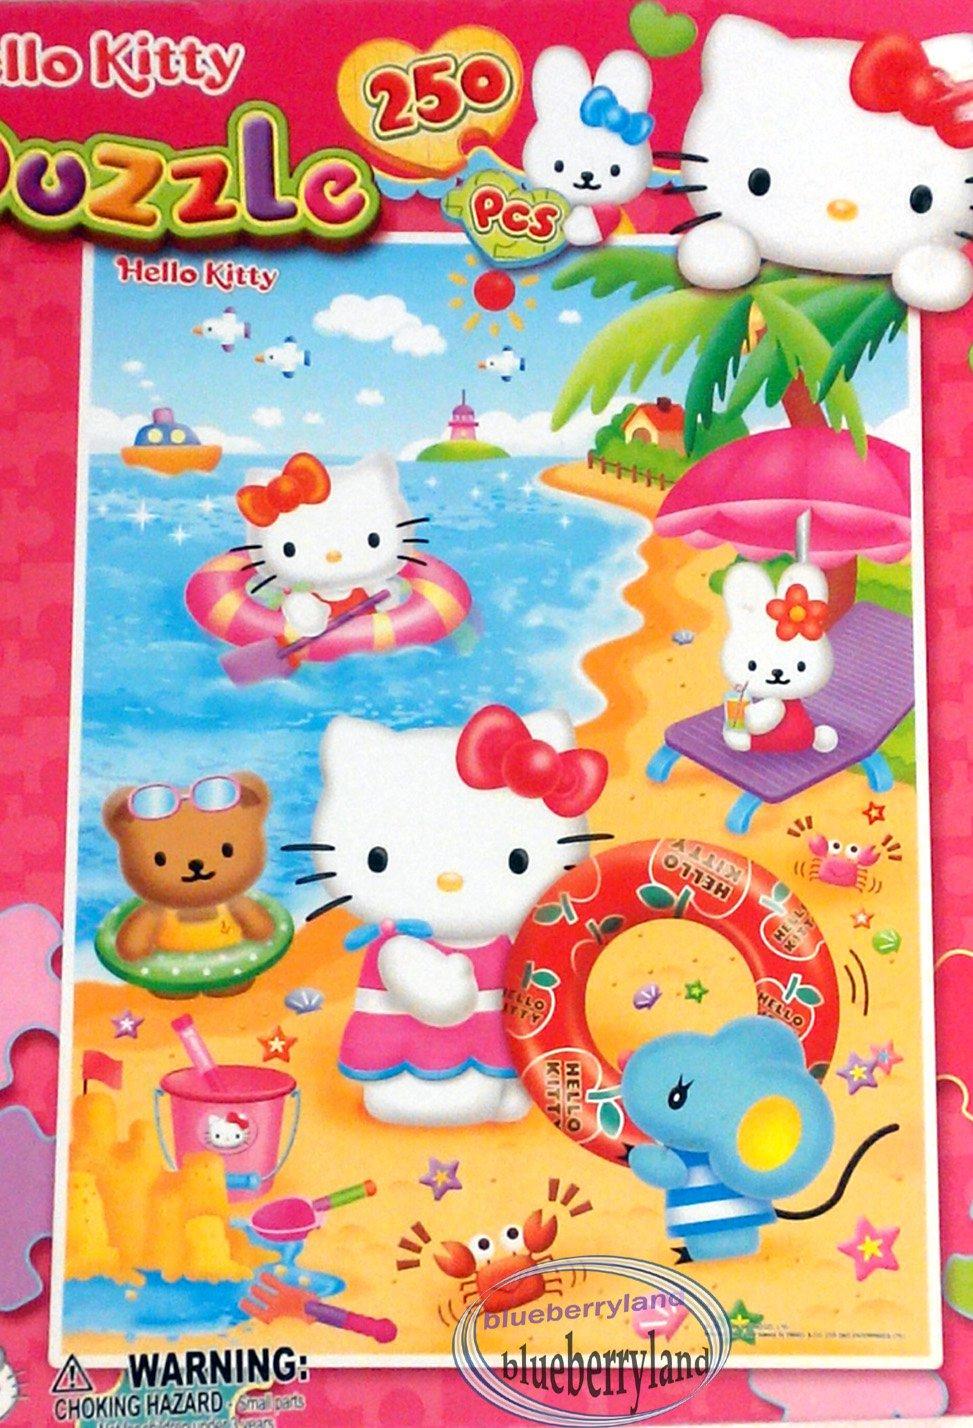 Sanrio Hello Kitty 250 PCS Jigsaw Puzzle games TOY christmas gift